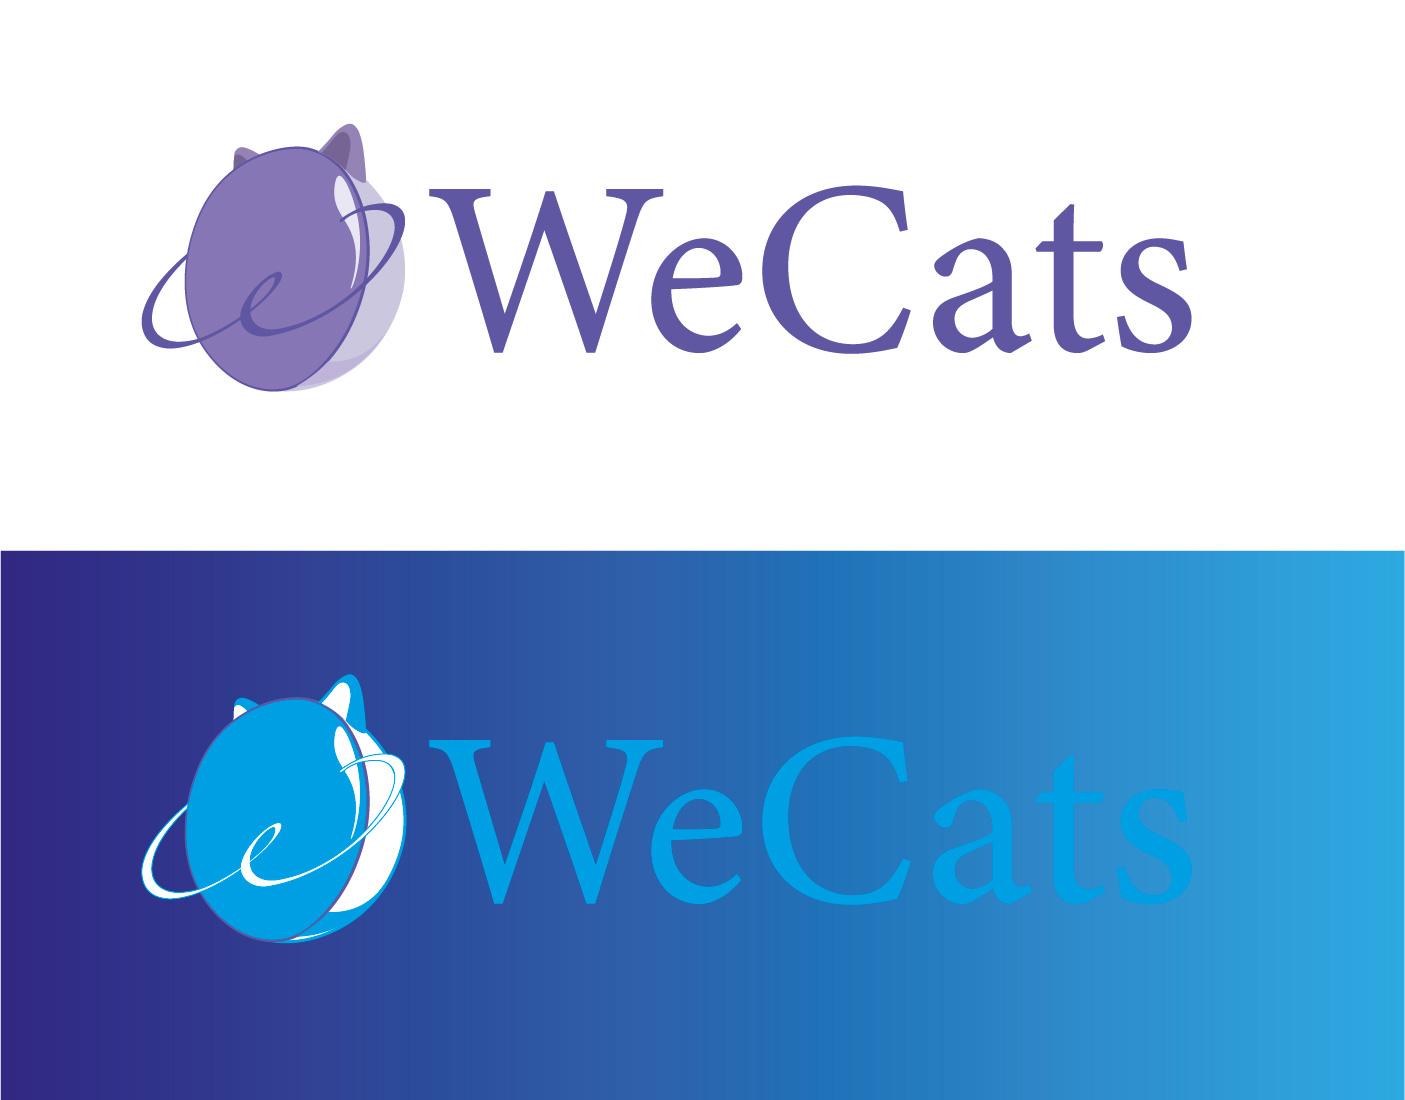 Создание логотипа WeCats фото f_1275f1a8d4ca1a32.jpg